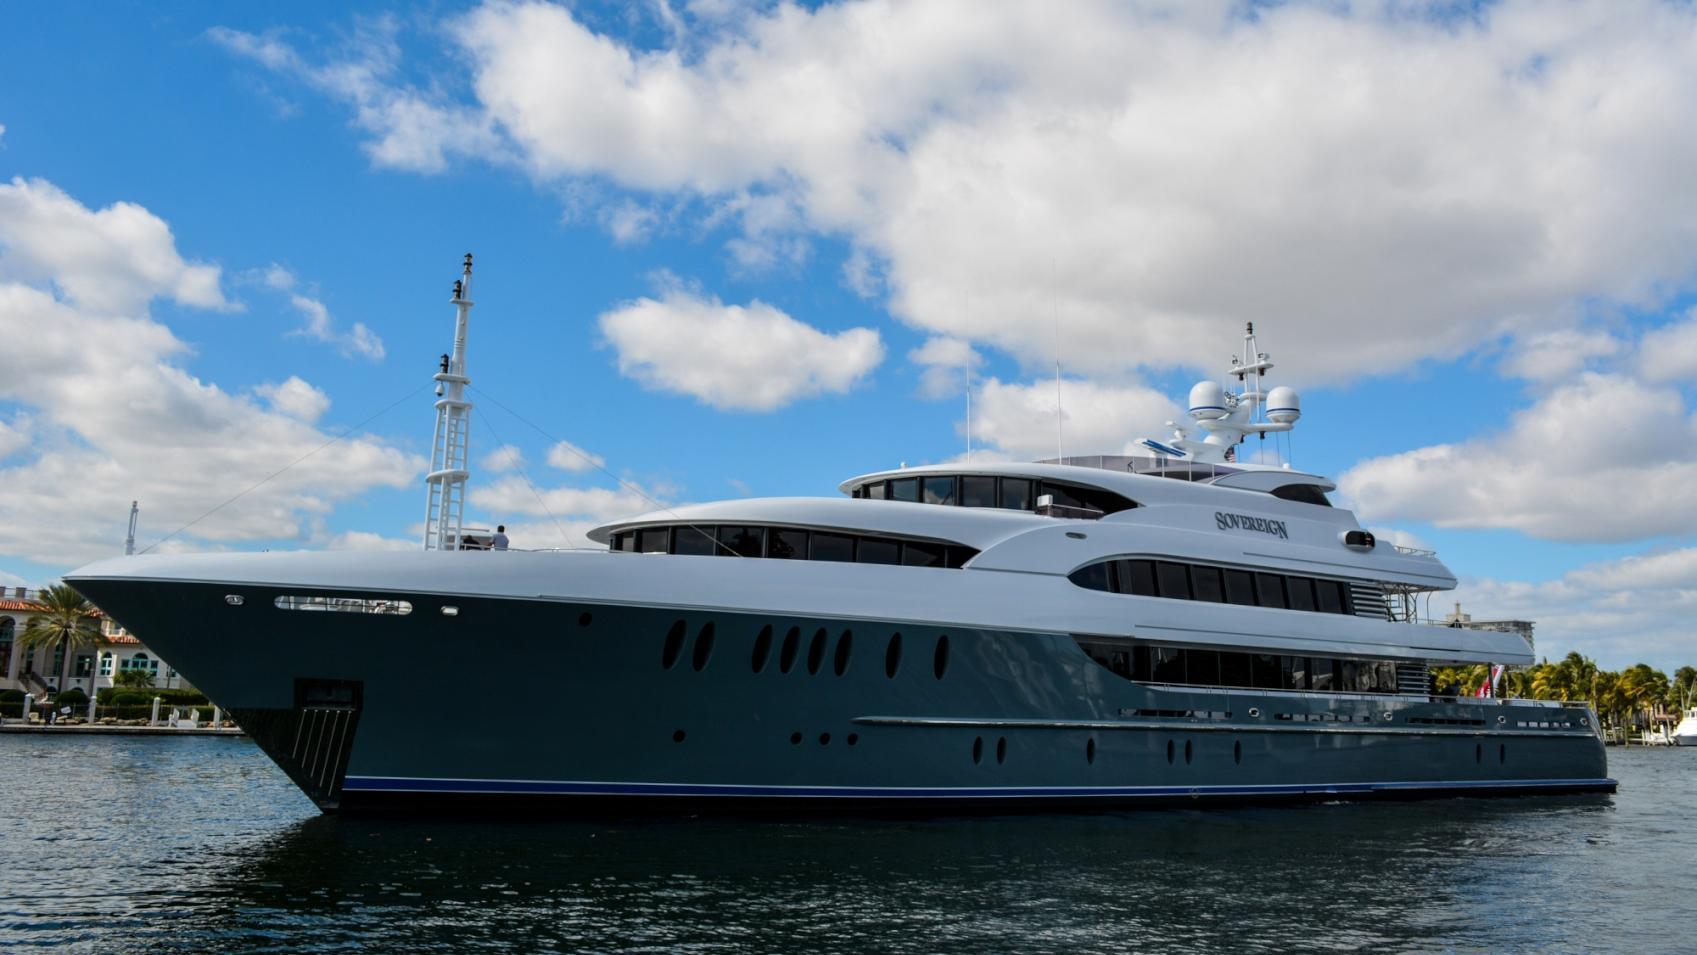 soverign motor yacht for sale profile